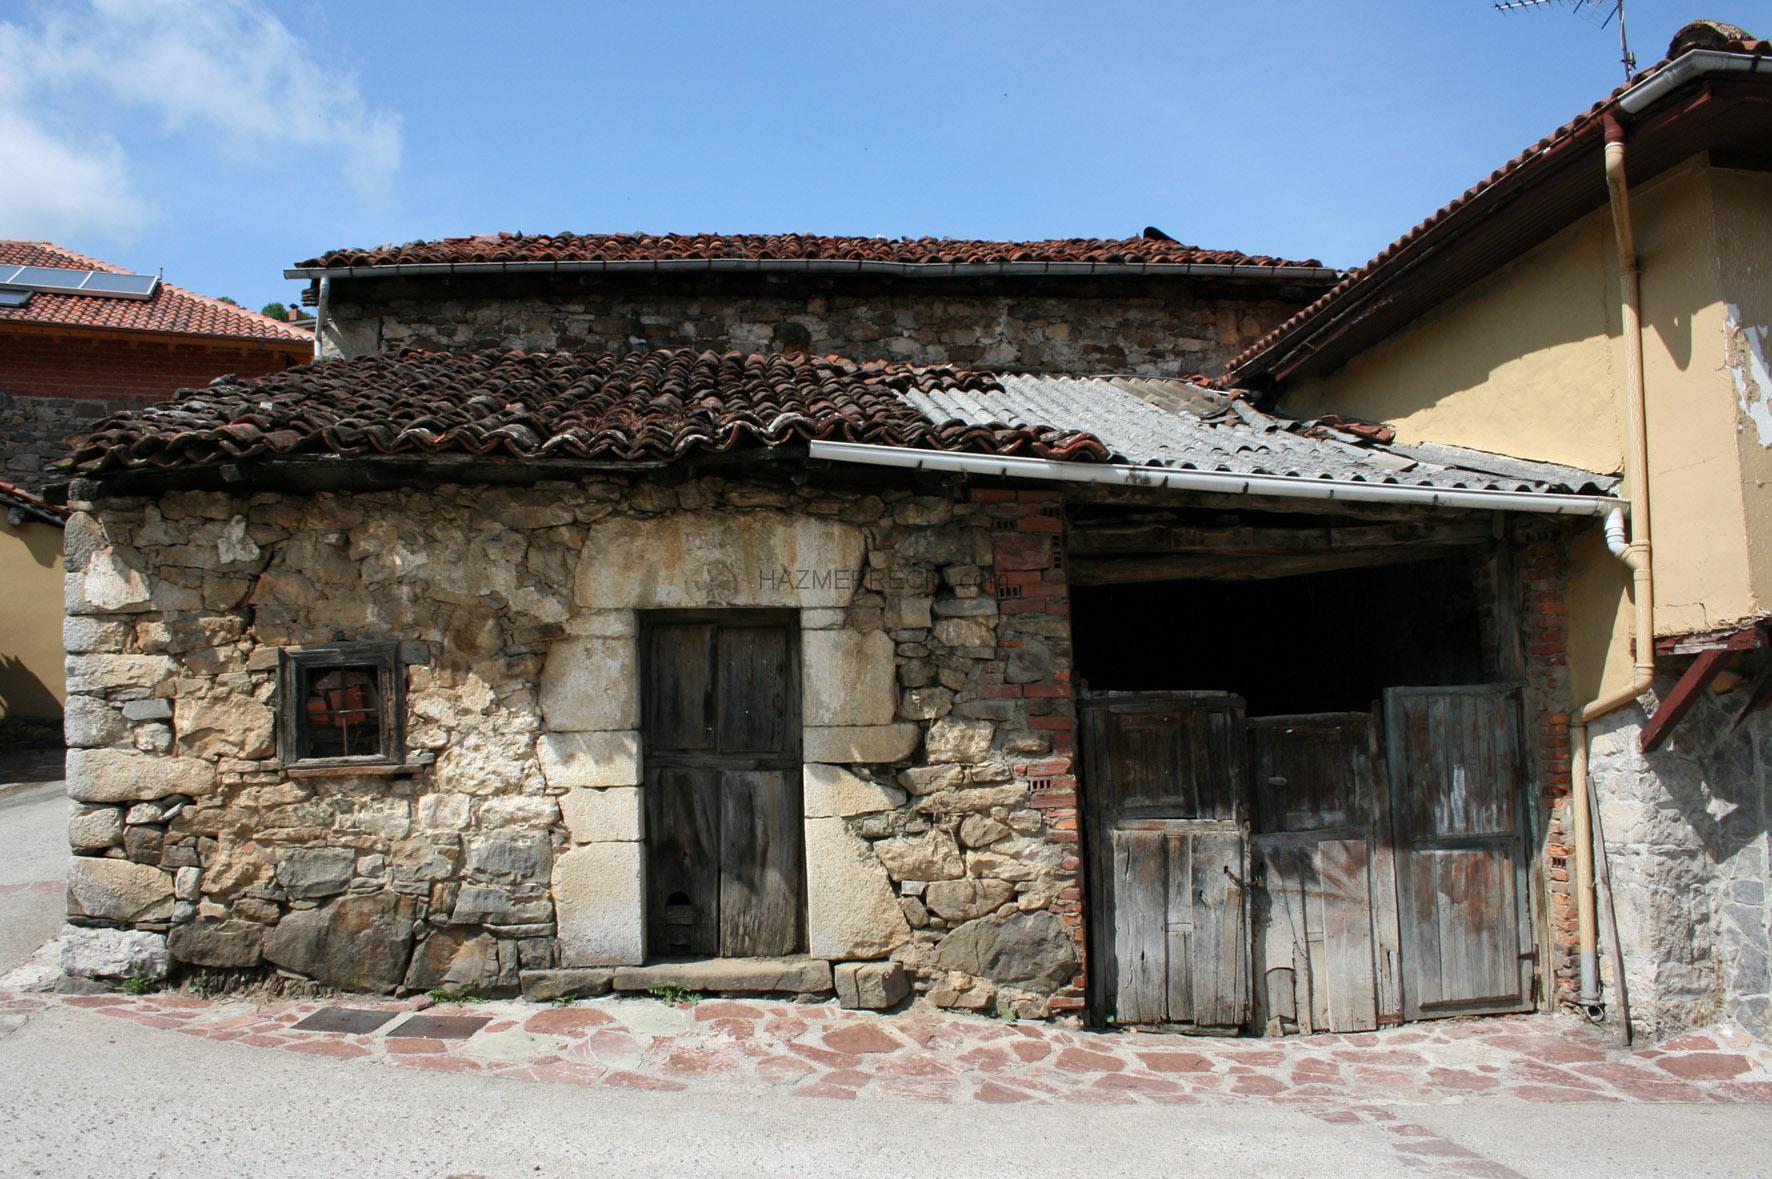 Rehabilitacion de casa de aldea parque nacional de redes gij n asturias - Rehabilitacion de casas antiguas ...